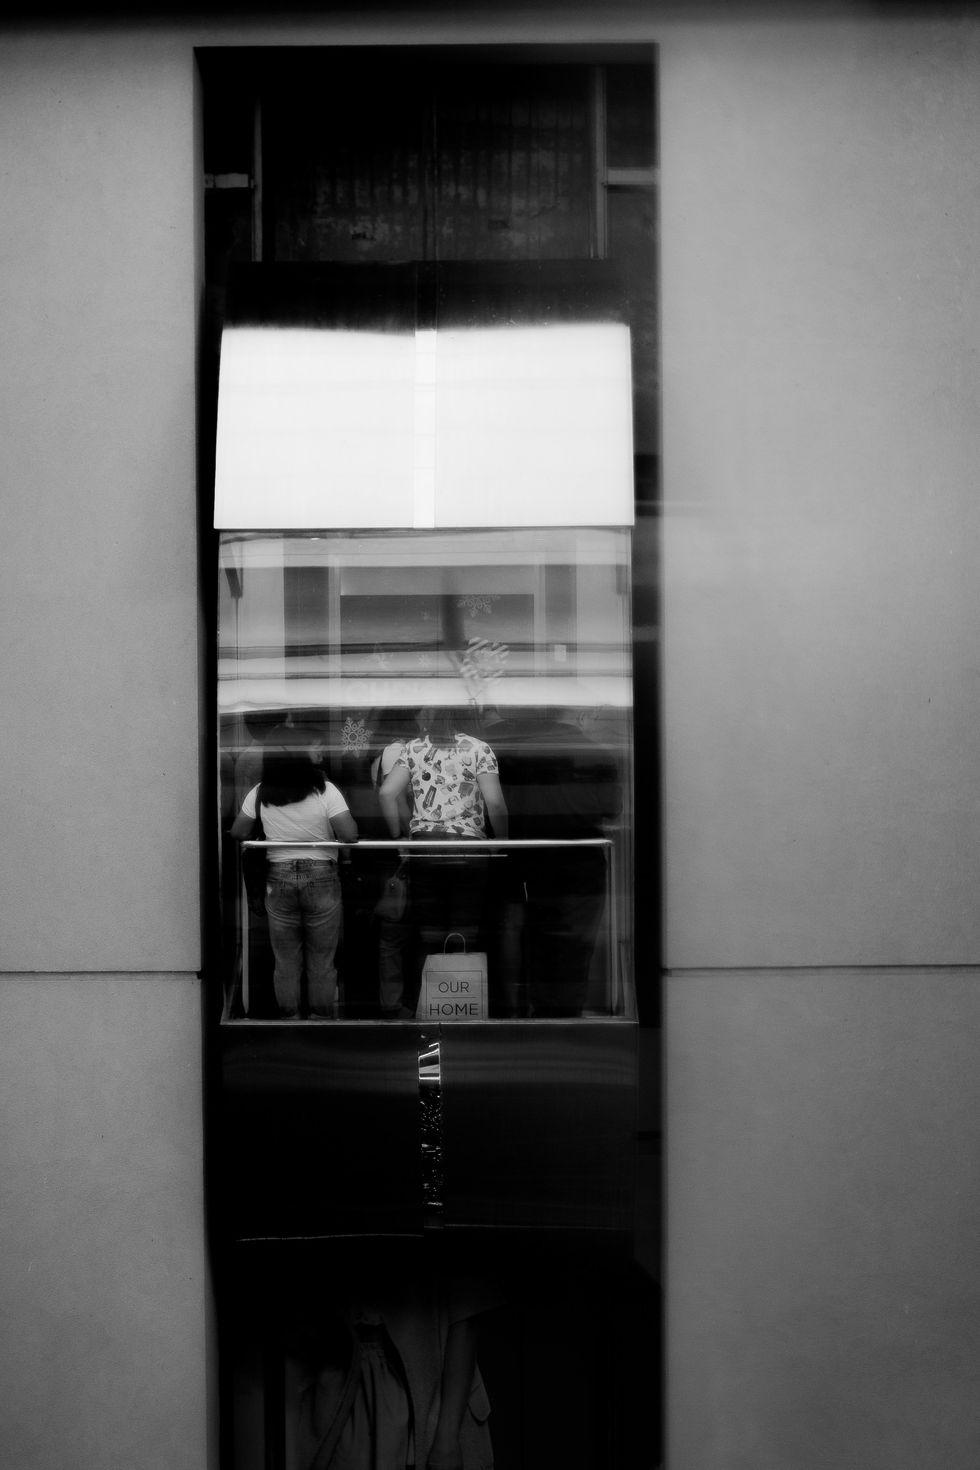 The Elevator Dilemma: A Poem